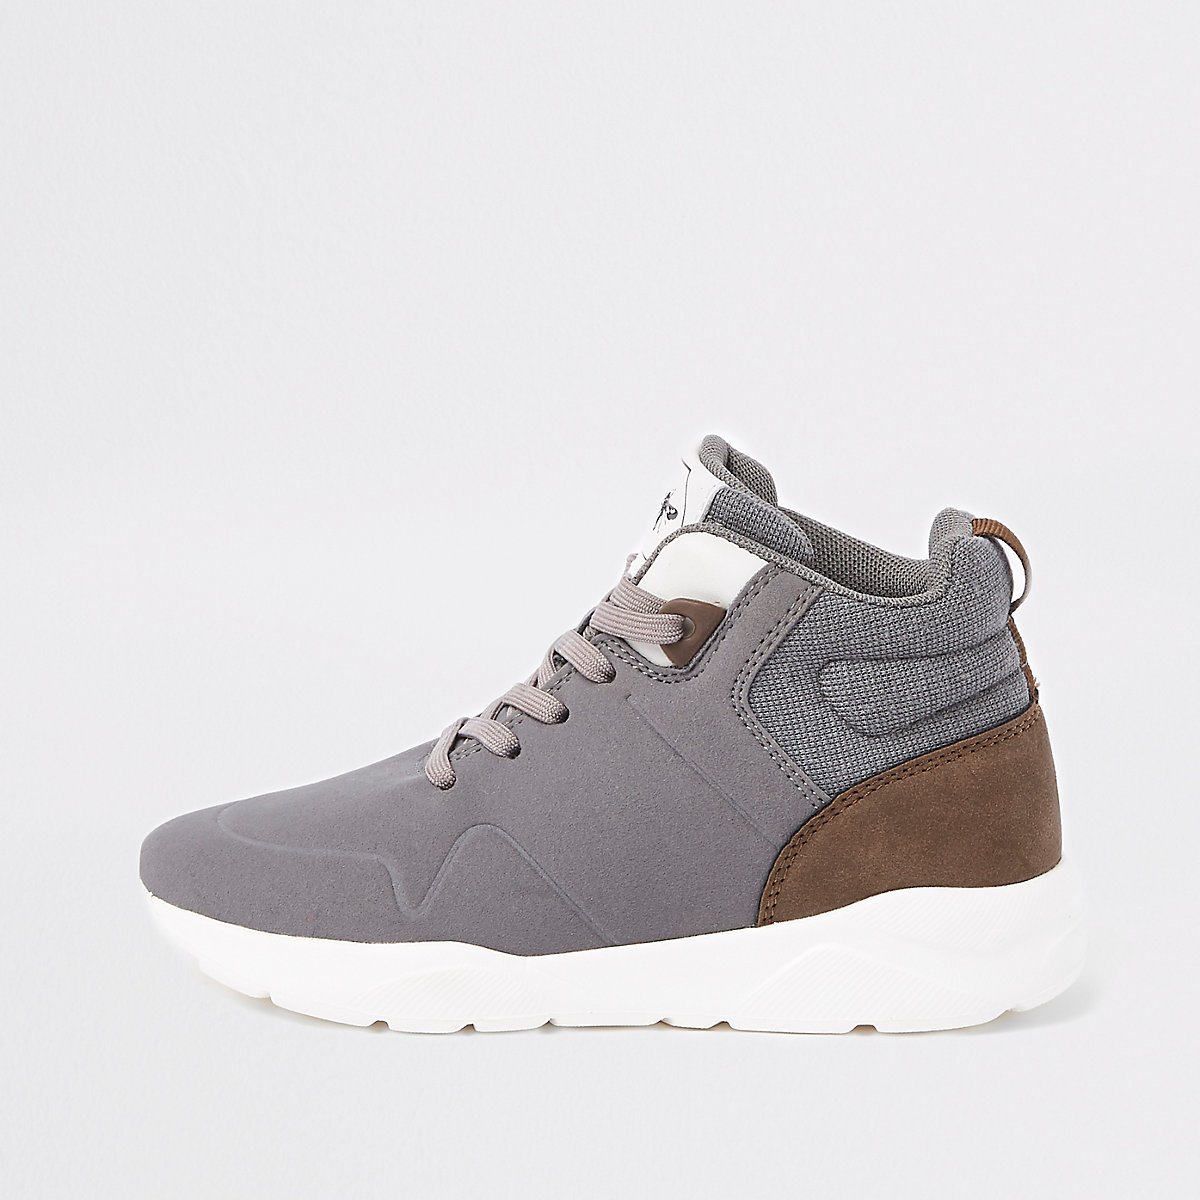 Boys grey hi-top runner sneakers